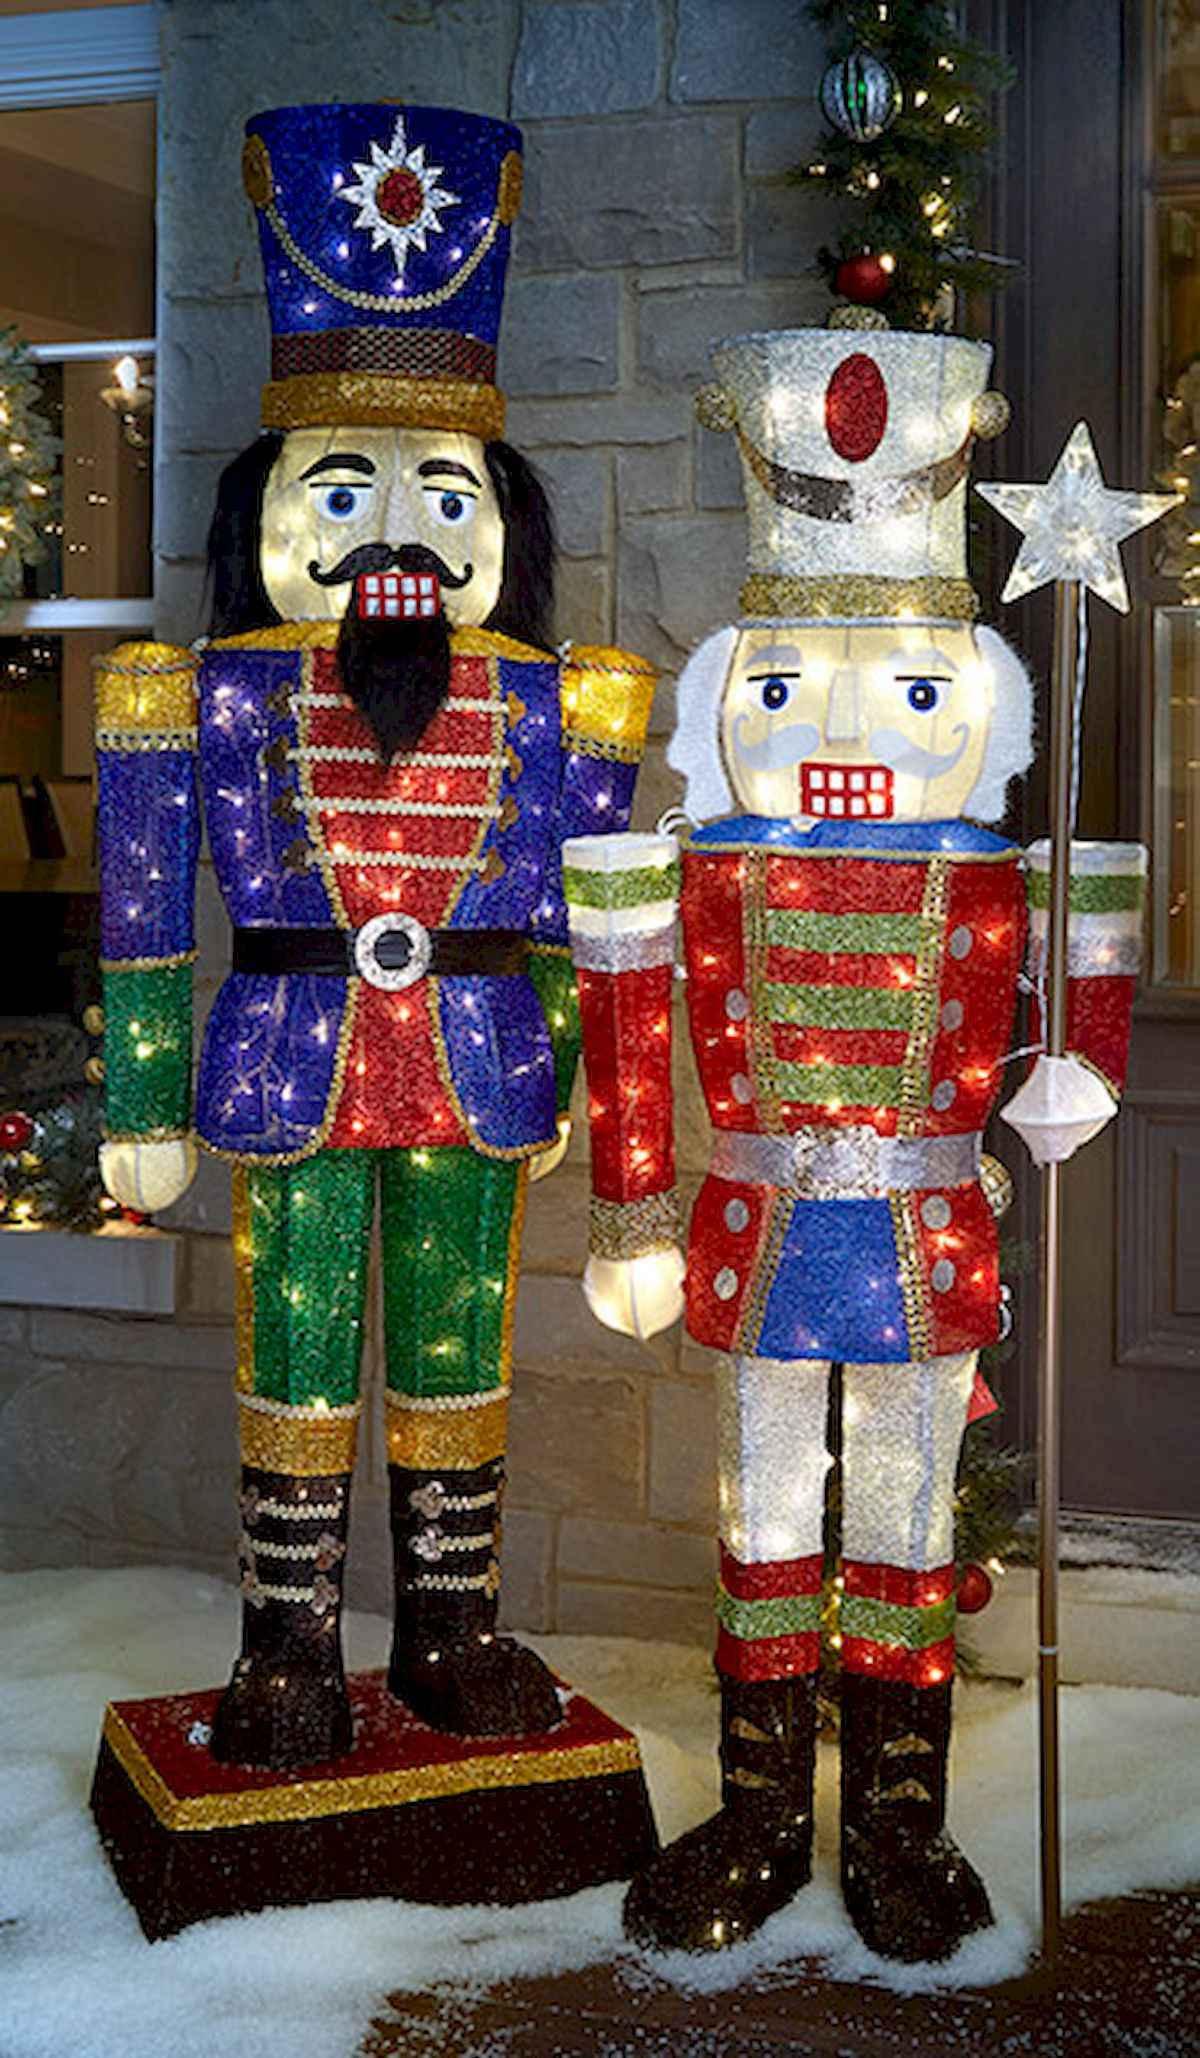 40 amazing outdoor christmas decorations ideas (33)